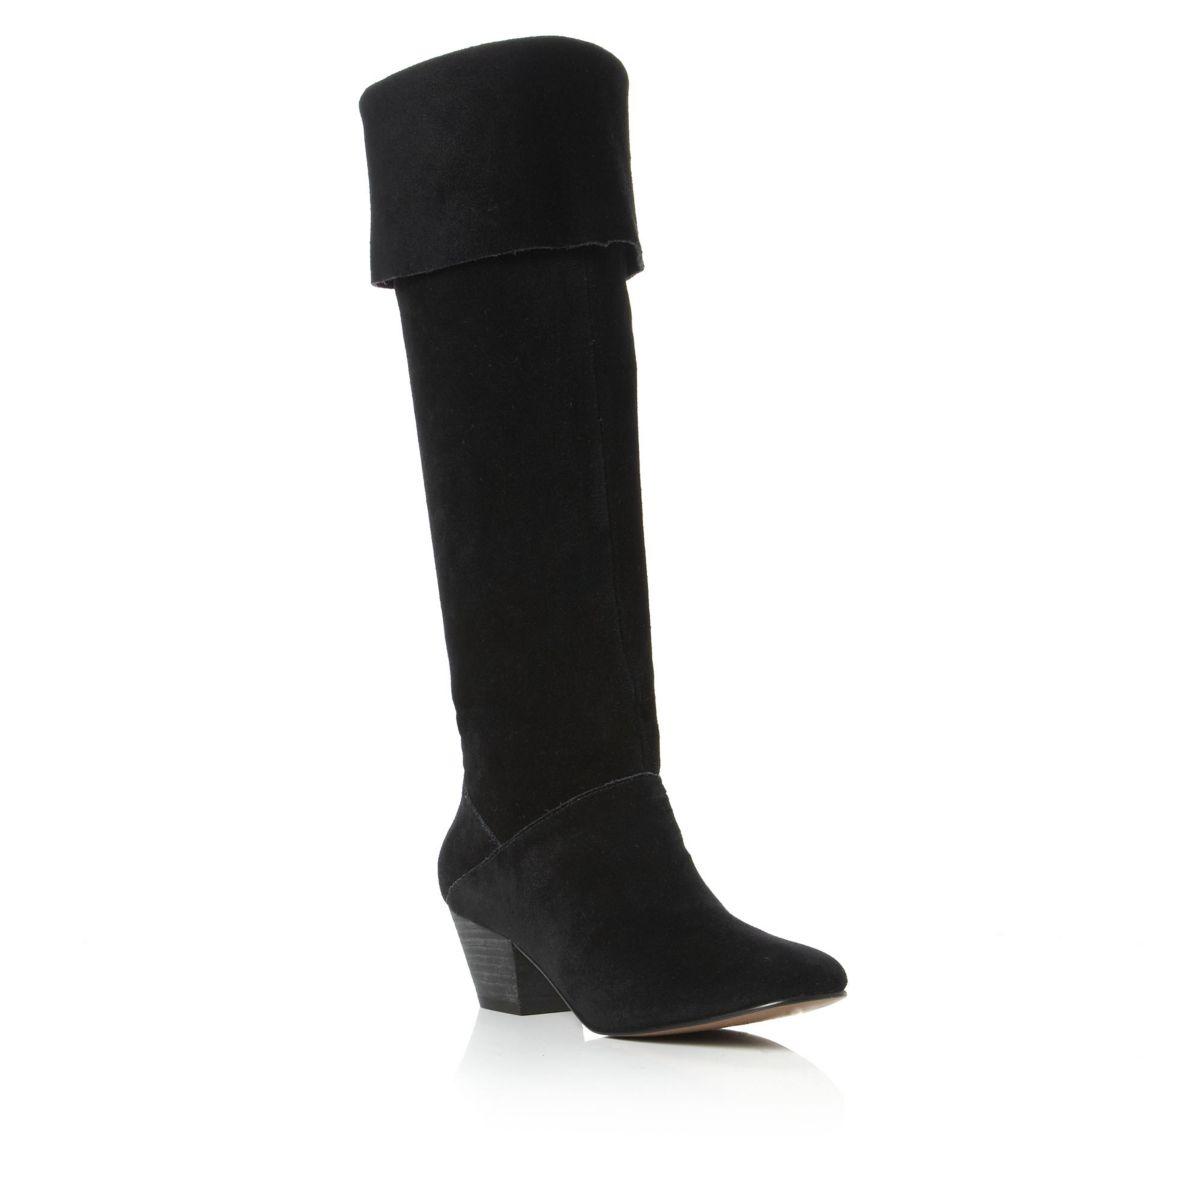 PIED-A-TERRE-SANDIE-BLACK-SUEDE-LADIES-KNEE-HIGH-HEEL-HI-LEG-CALF-BOOTS-SIZE-3-8